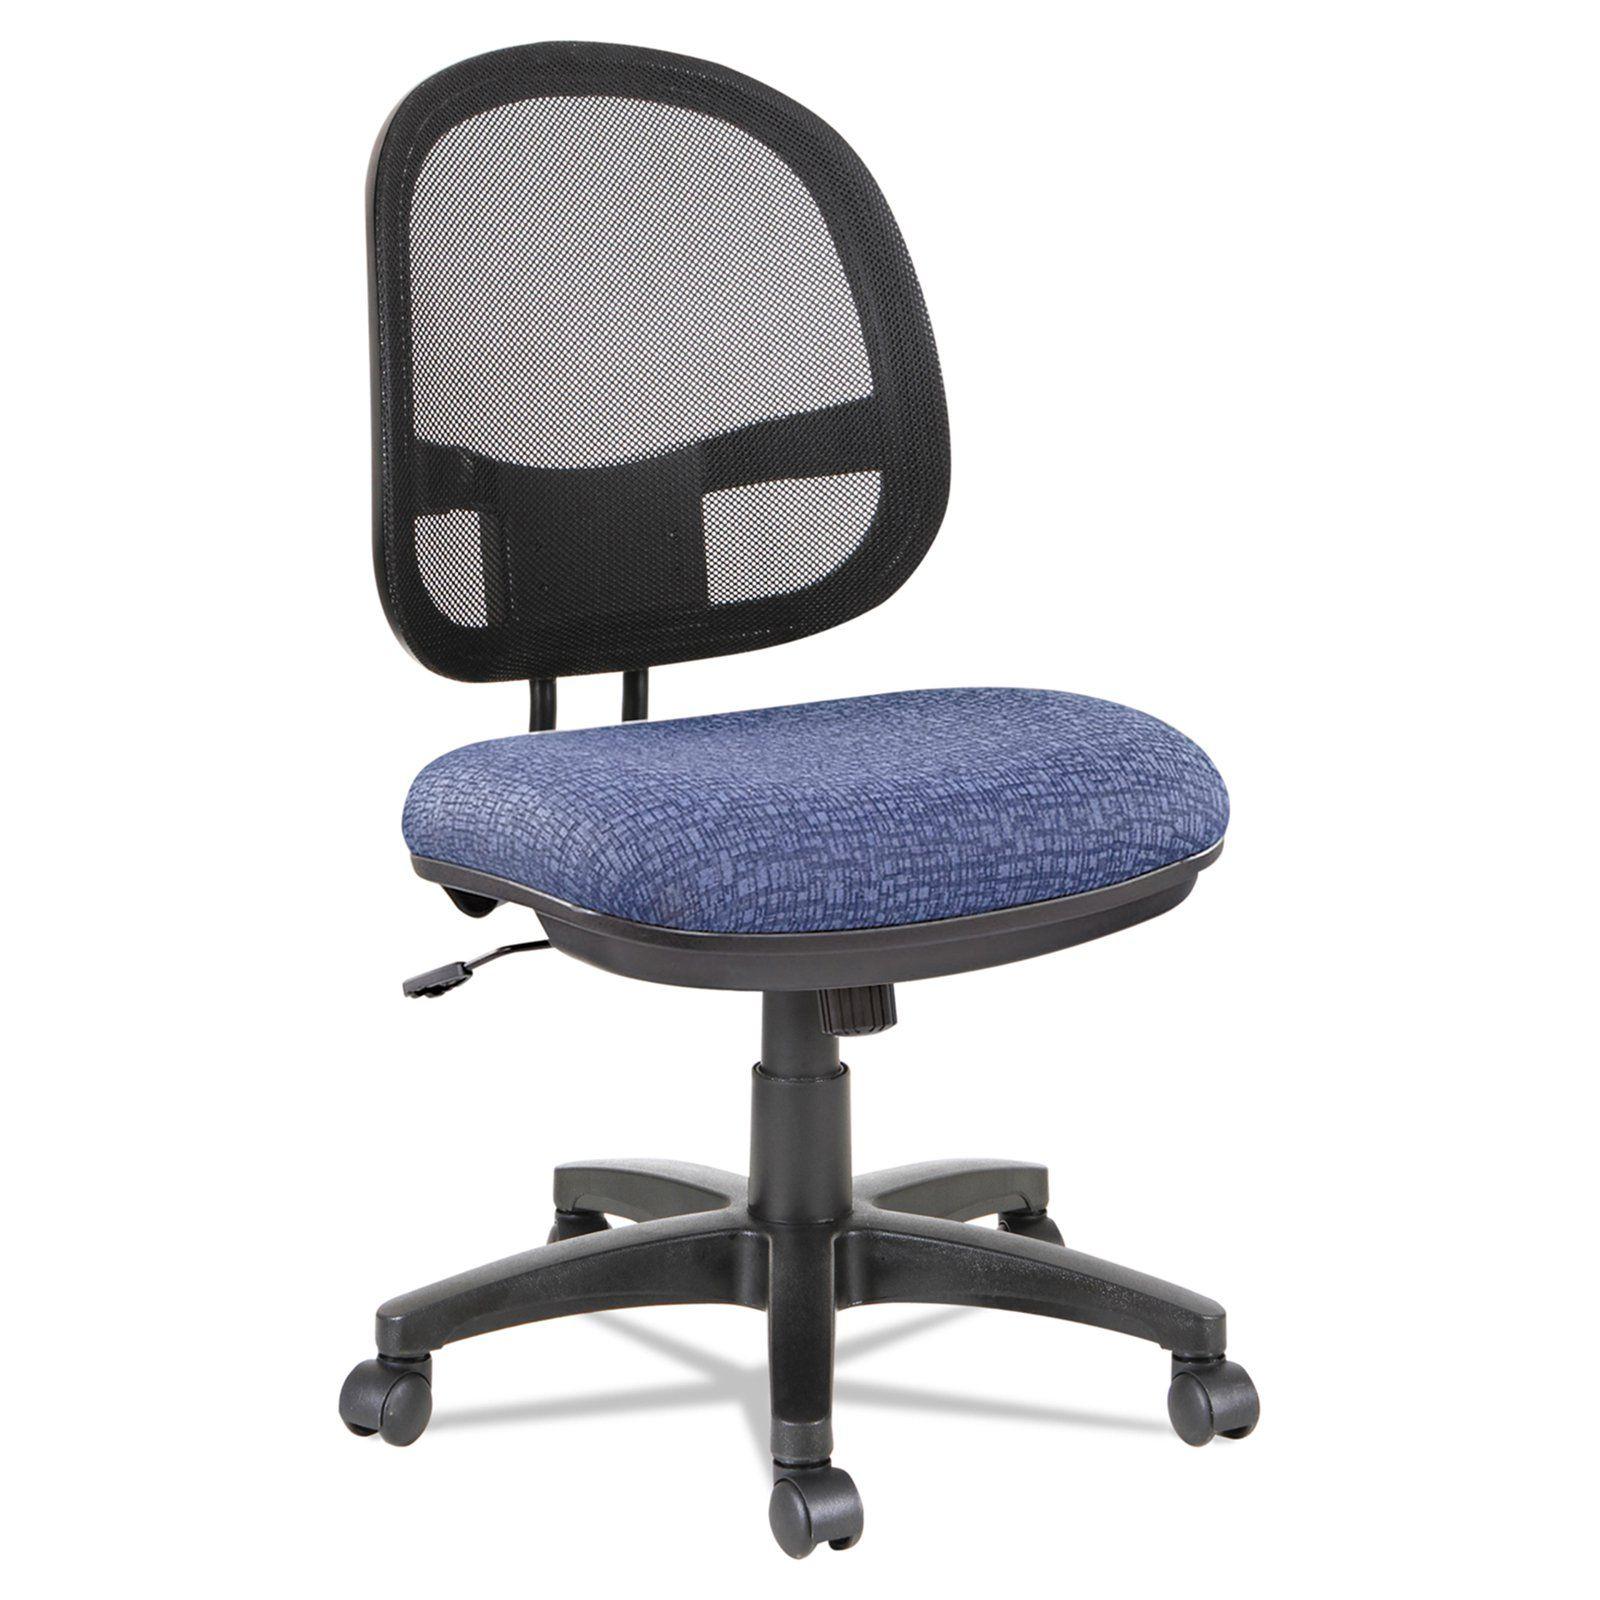 Alera Interval Series Swivel Tilt Mesh Chair Marine Blue Mesh